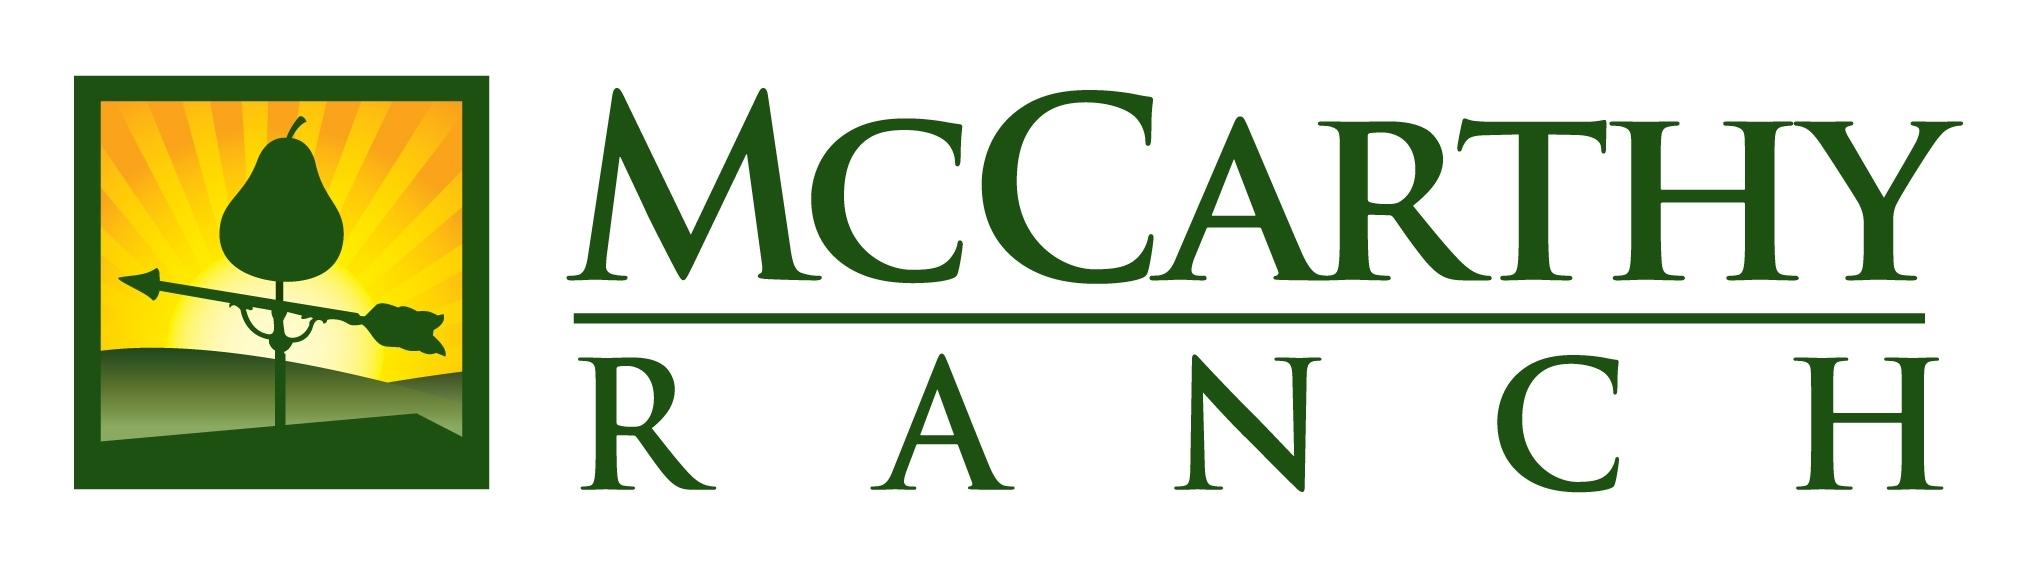 McCarthy Ranch.jpg